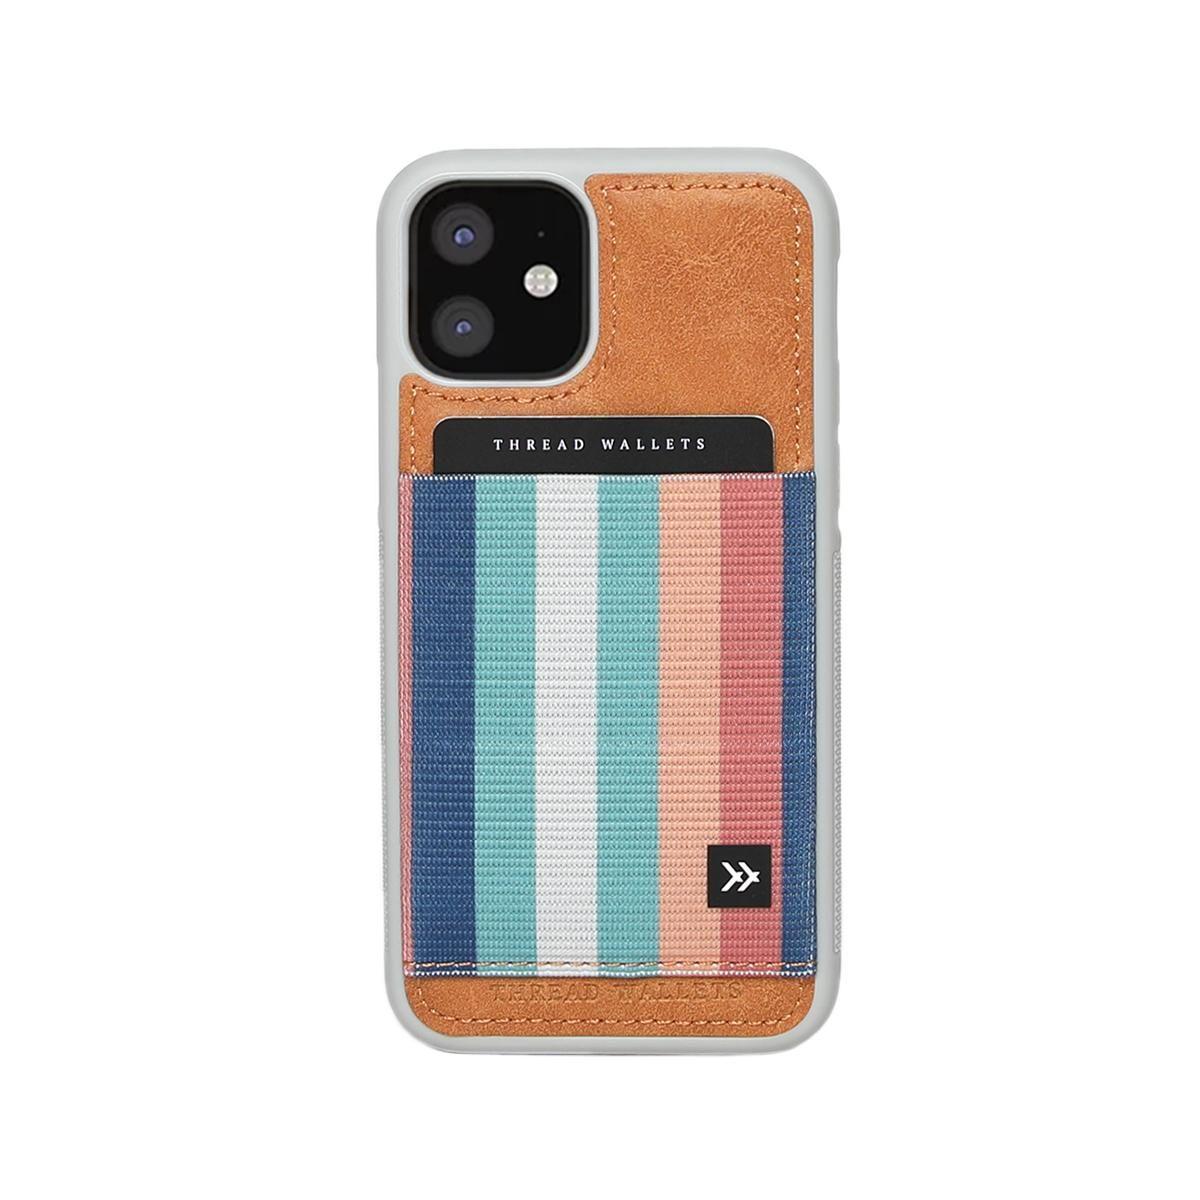 Https Cdn Shopify Com S Files 1 1030 4291 Products 4 B9c703a4 458d 48f5 Afda Eefc78b1c835 607x 2x Wallet Phone Case Wallet Phone Case Iphone Gold Phone Case